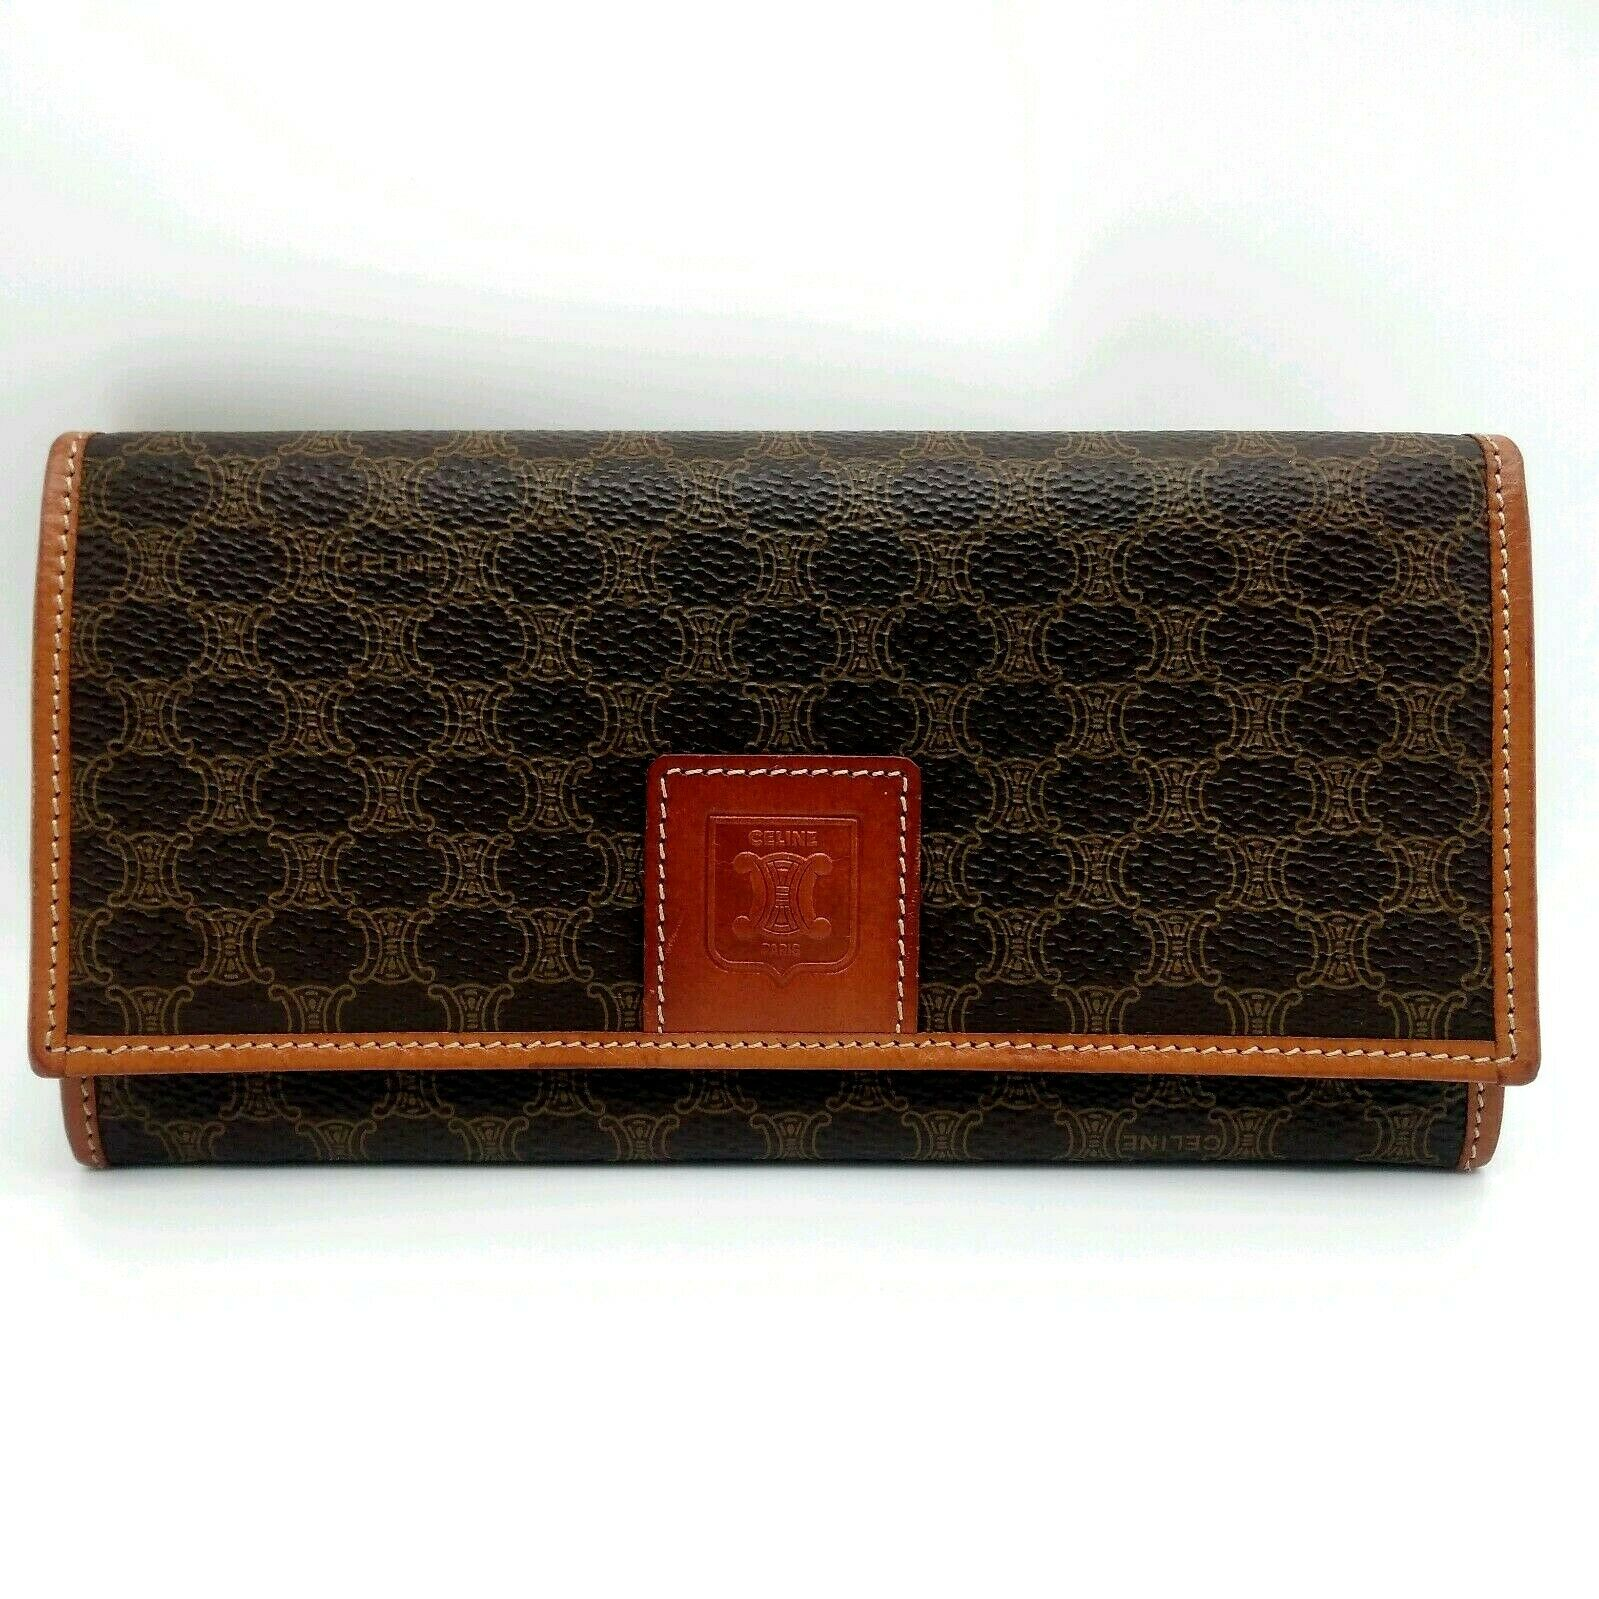 【RANK AB】Authentic Vintage Celine Macadam wallet from Japan R010